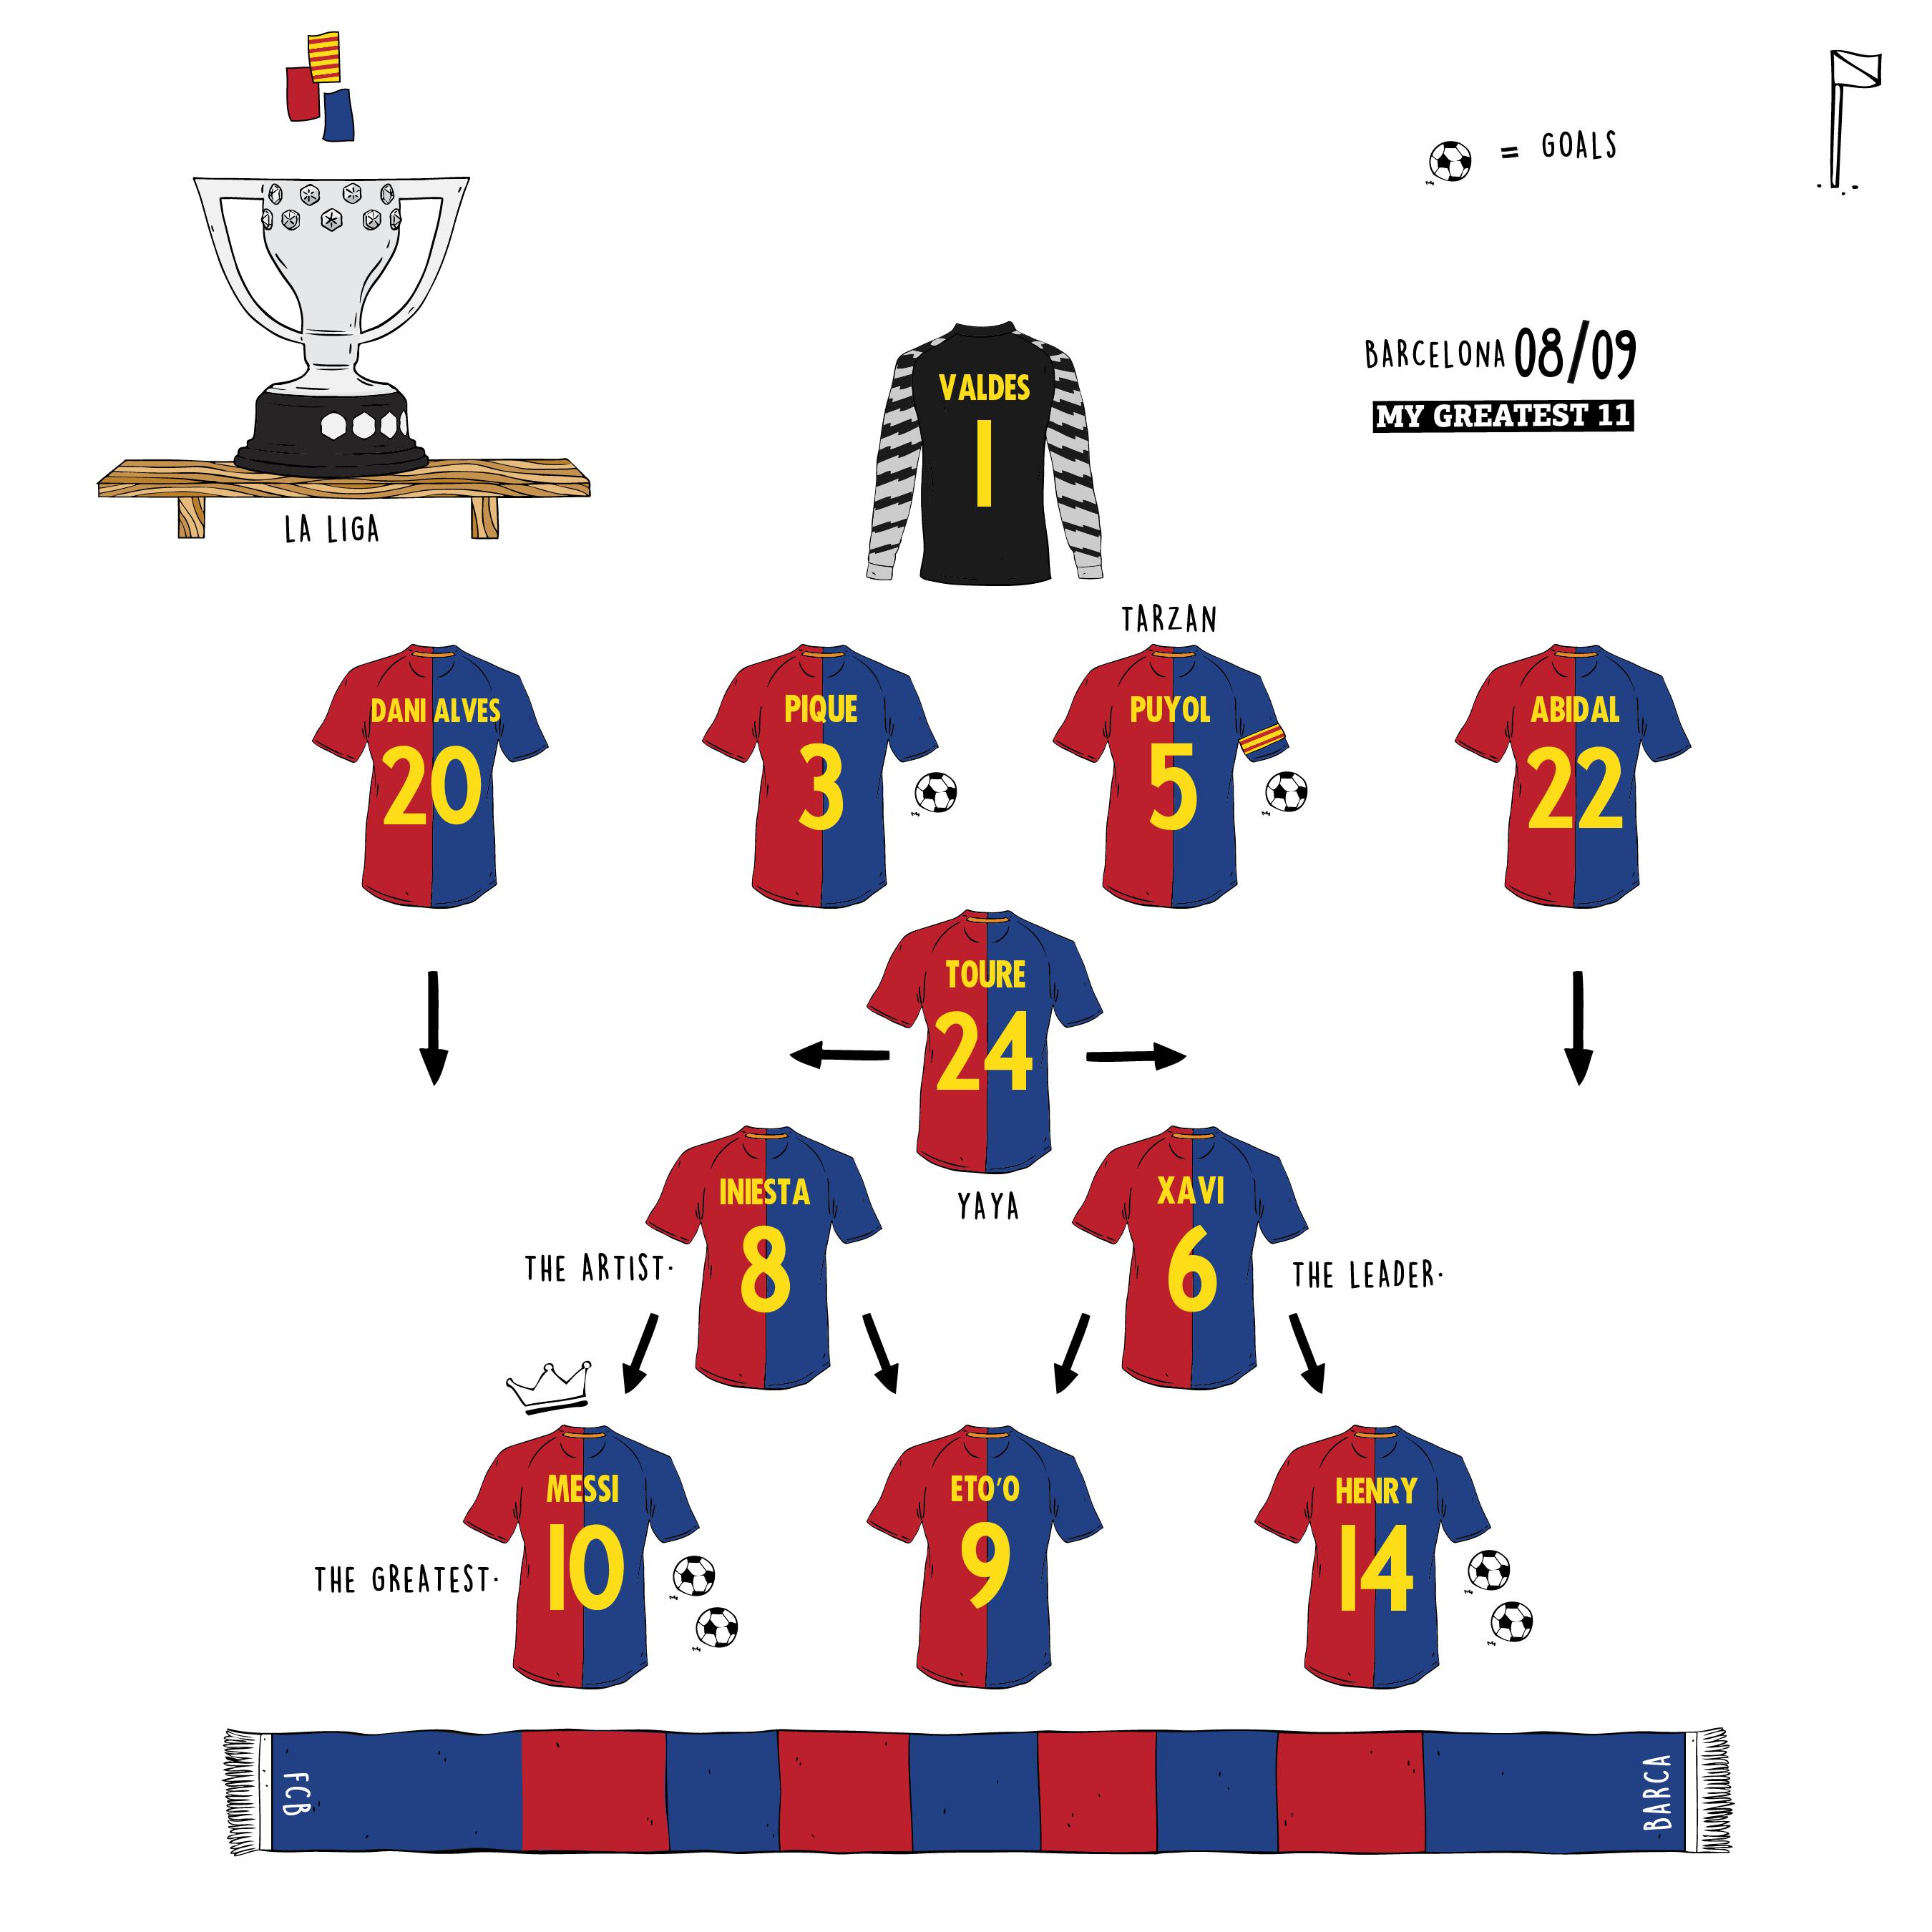 Fcb Xi 2009 Melhores Jogadores De Futebol Futebol Jogadores De Futebol